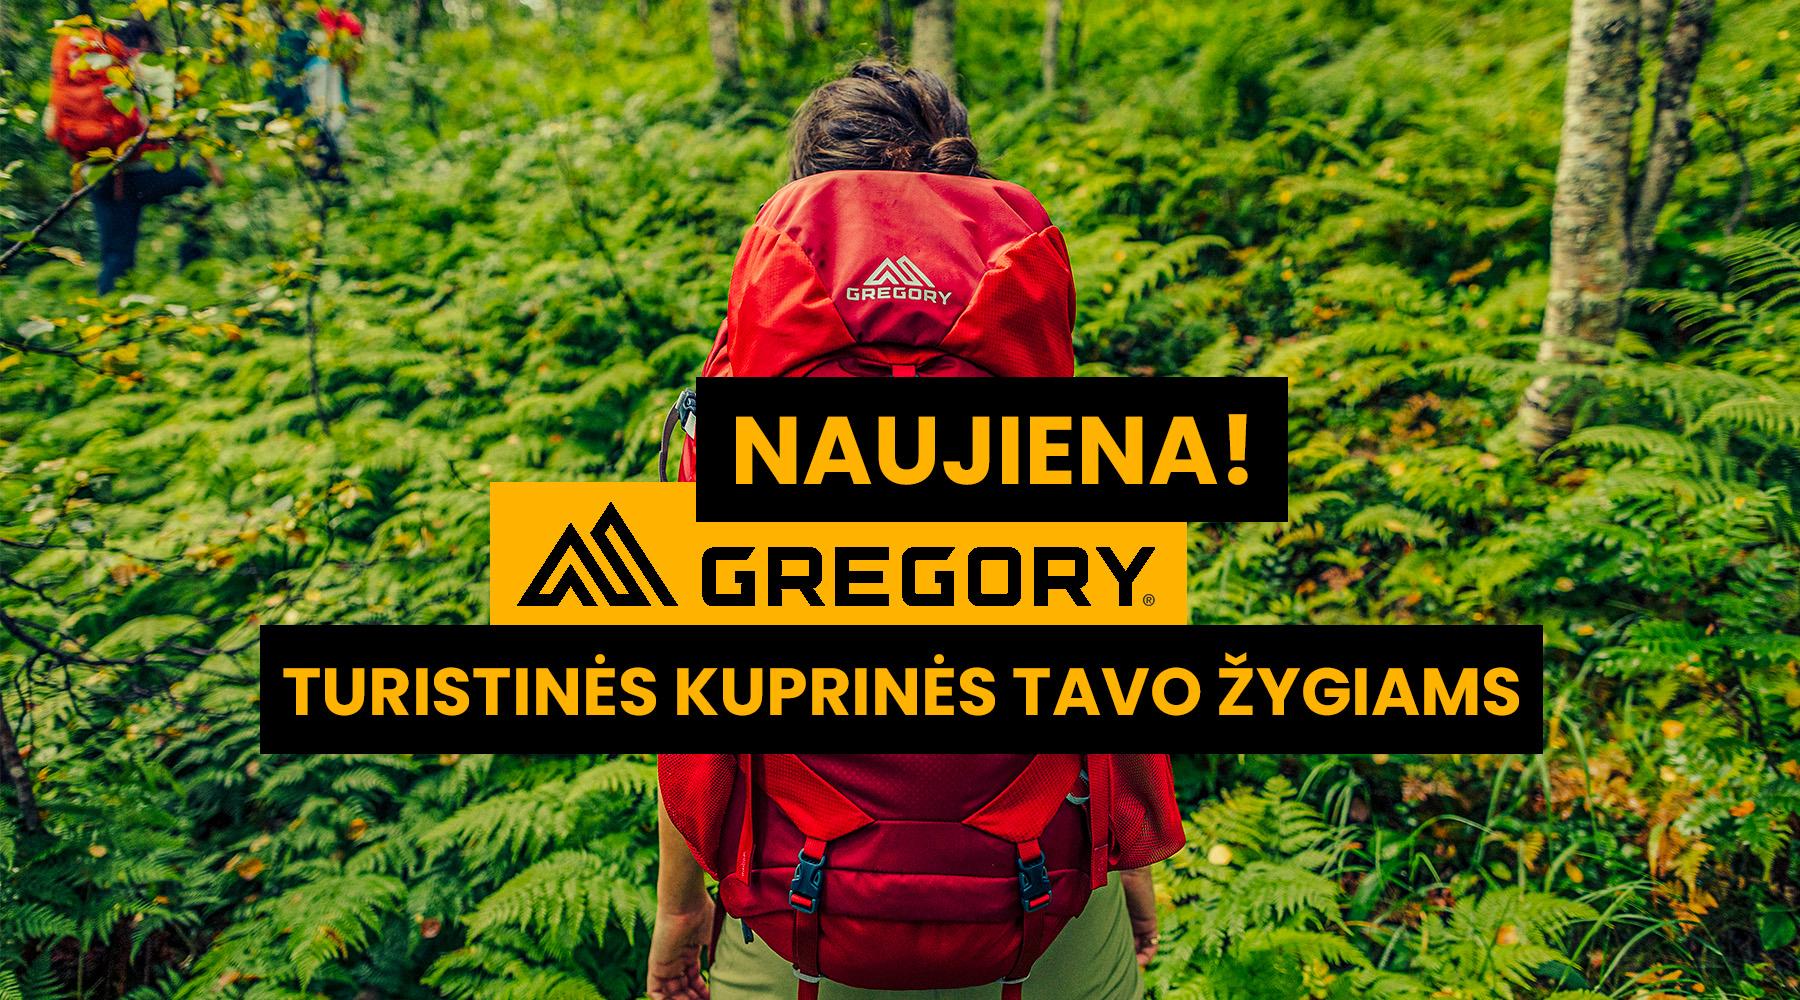 zygiams kuprines kokybiskos gregory hiking treking